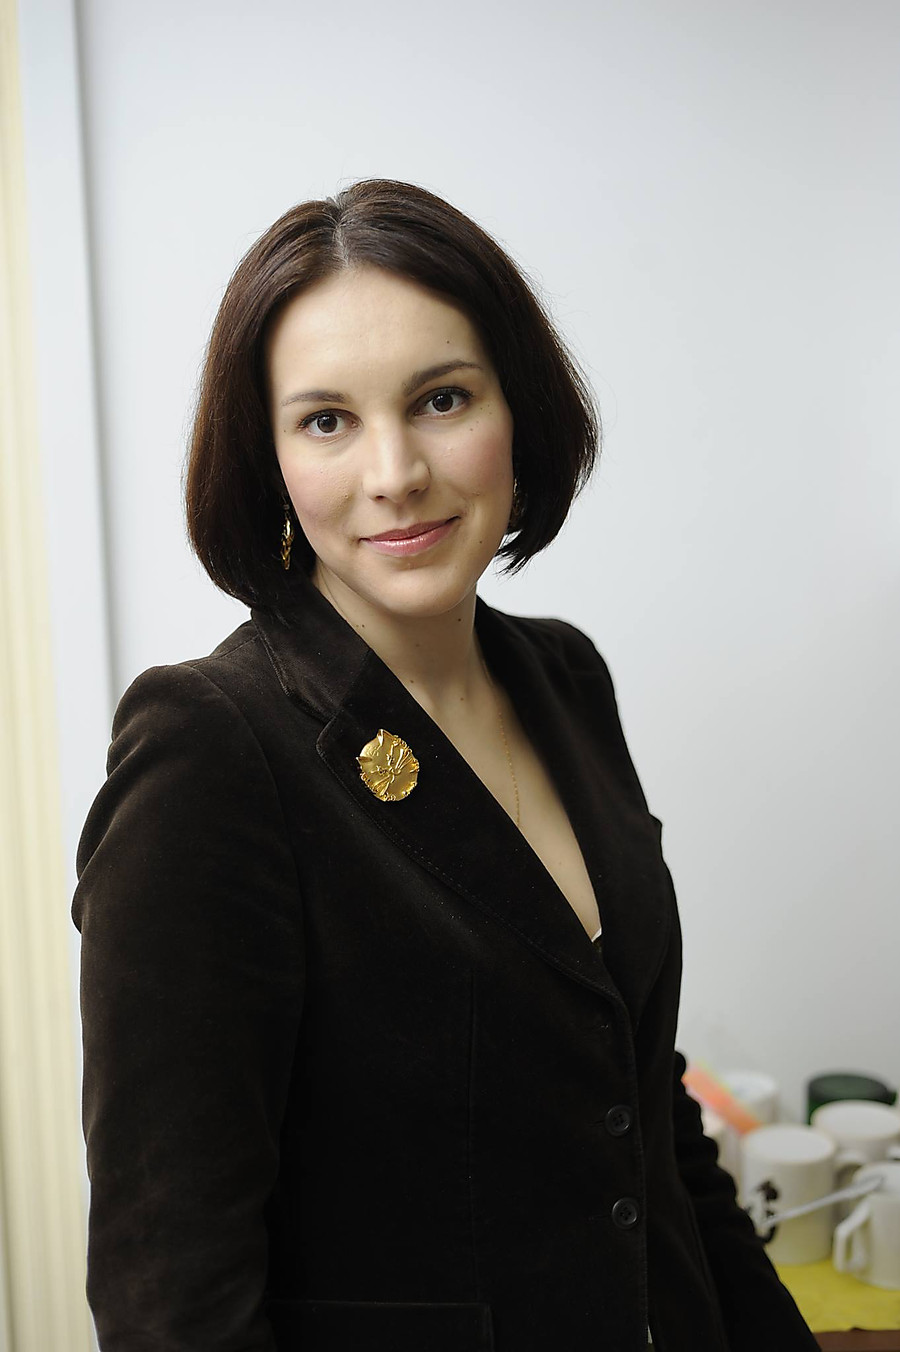 Sonya Koshkina Nude Photos 64